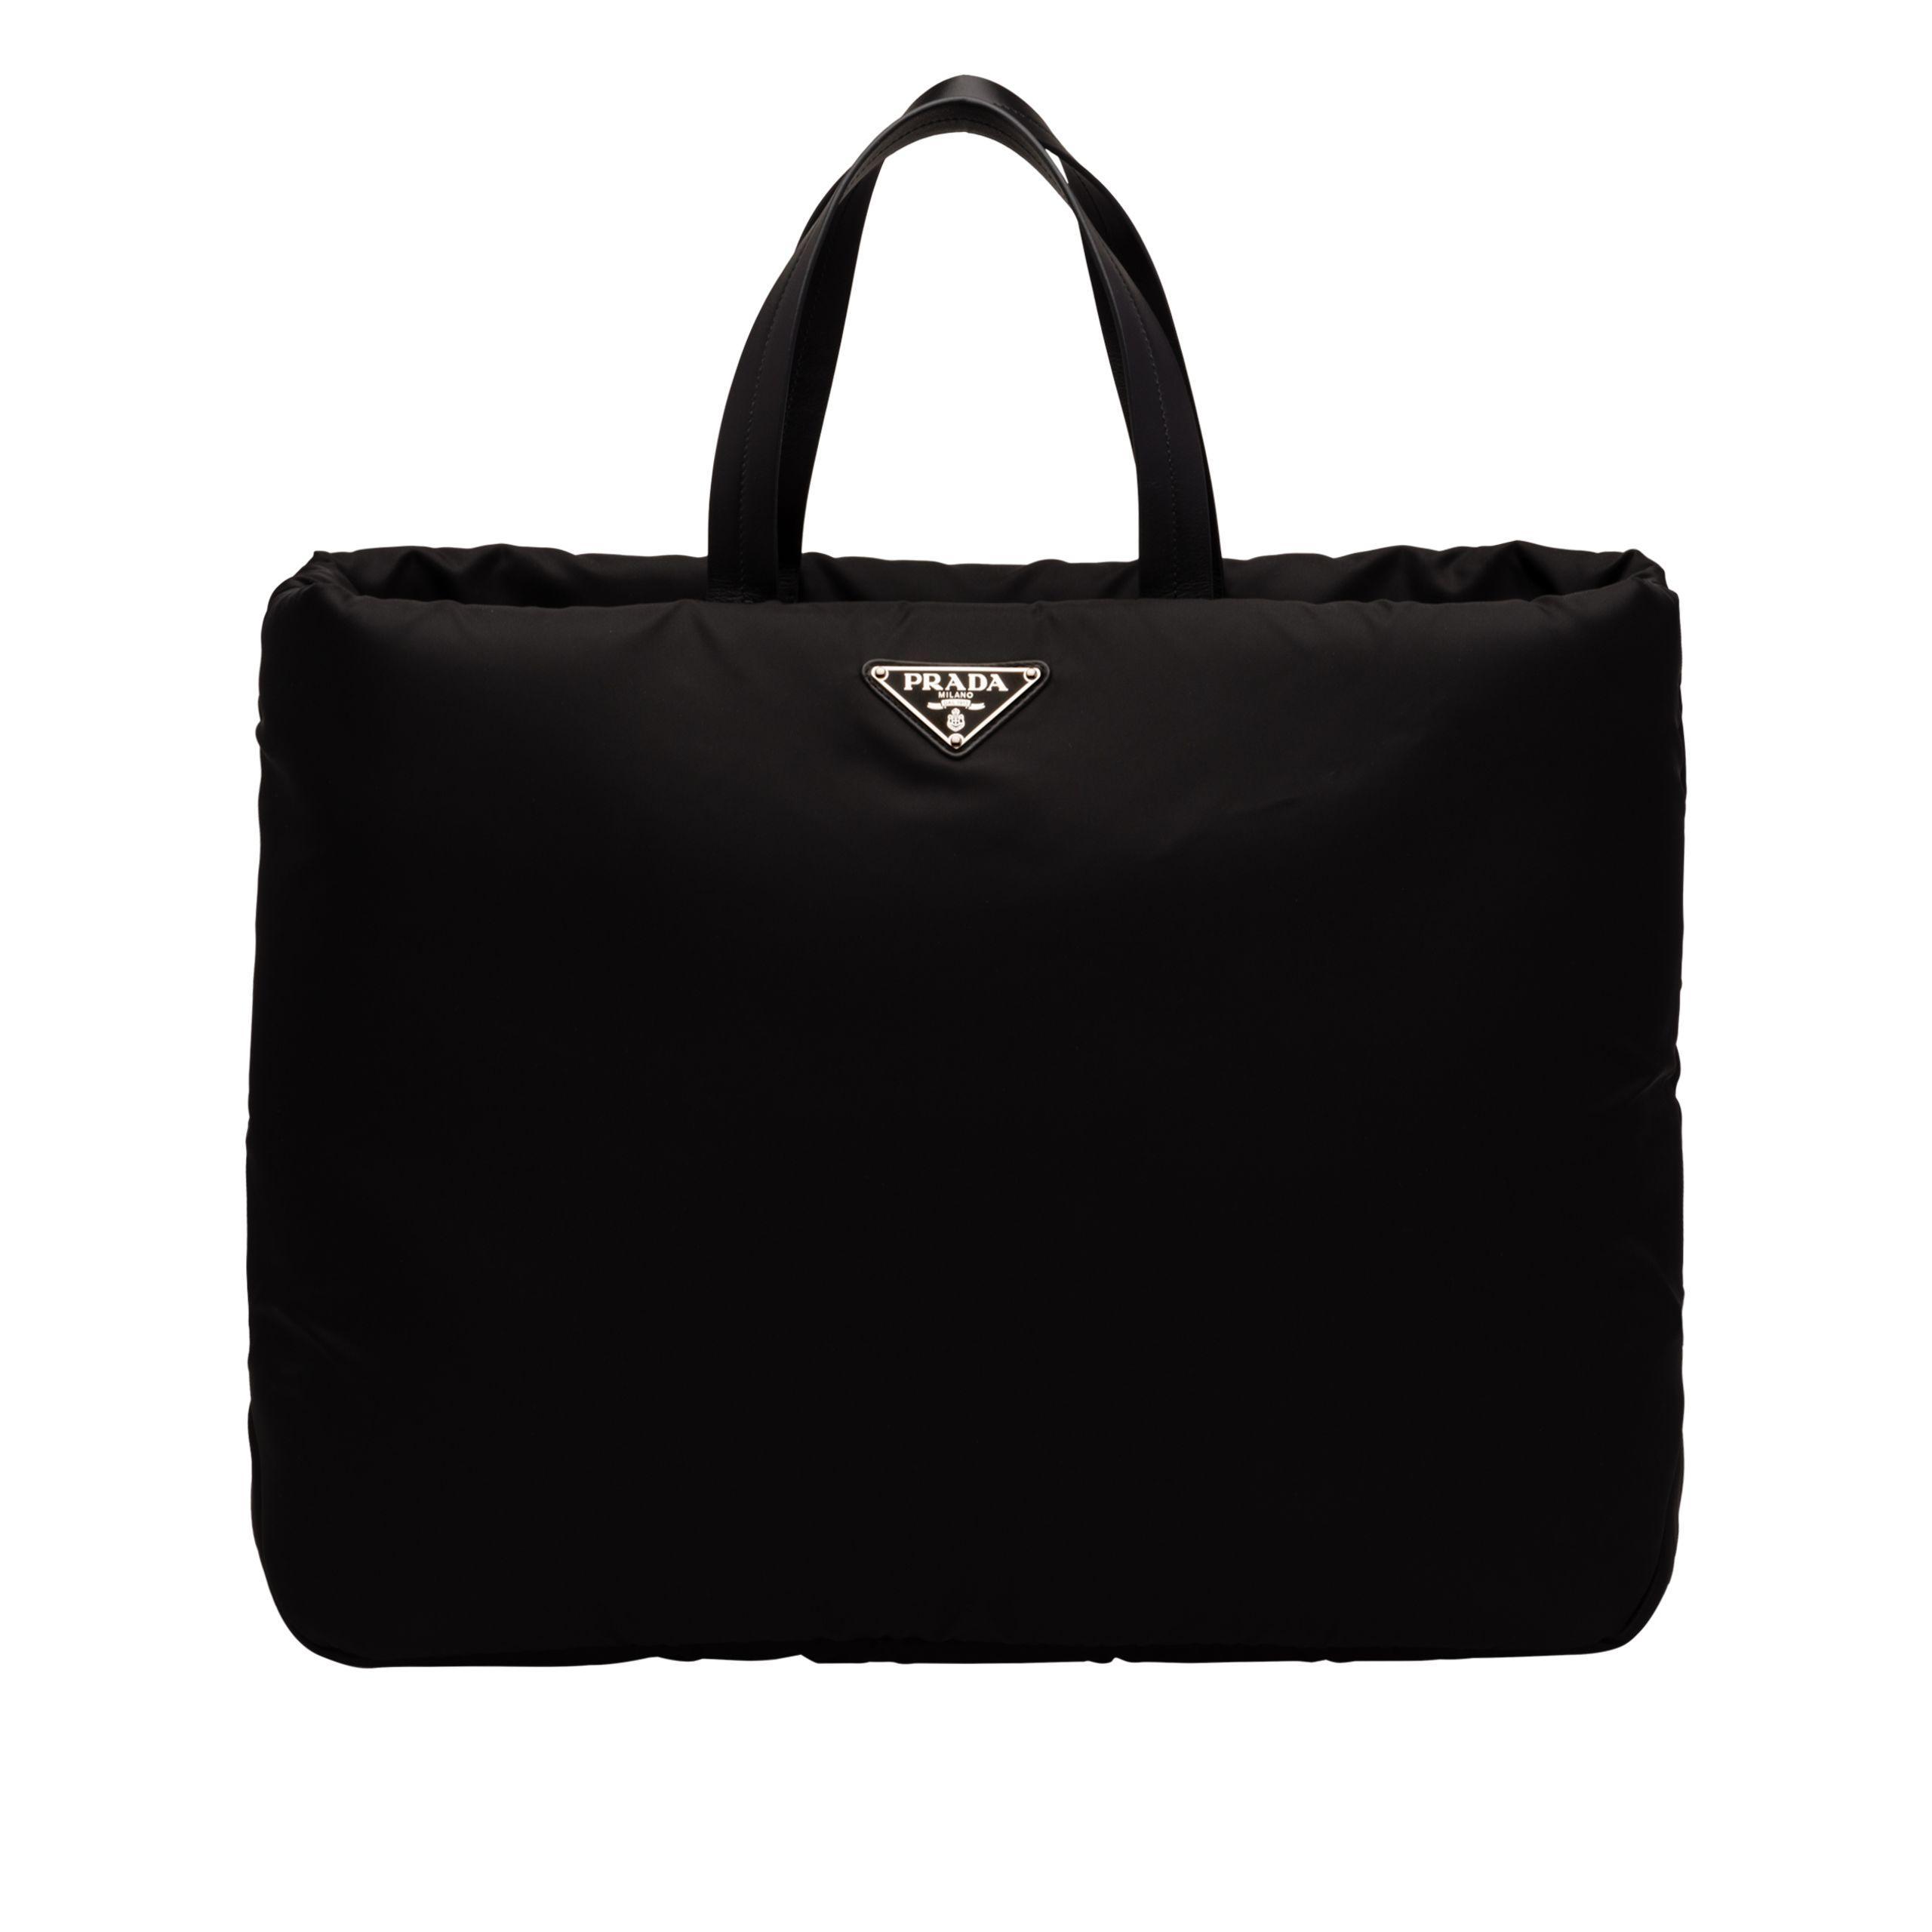 8c2120ed8ff6 Prada - Black Large Padded Nylon Tote - Lyst. View fullscreen